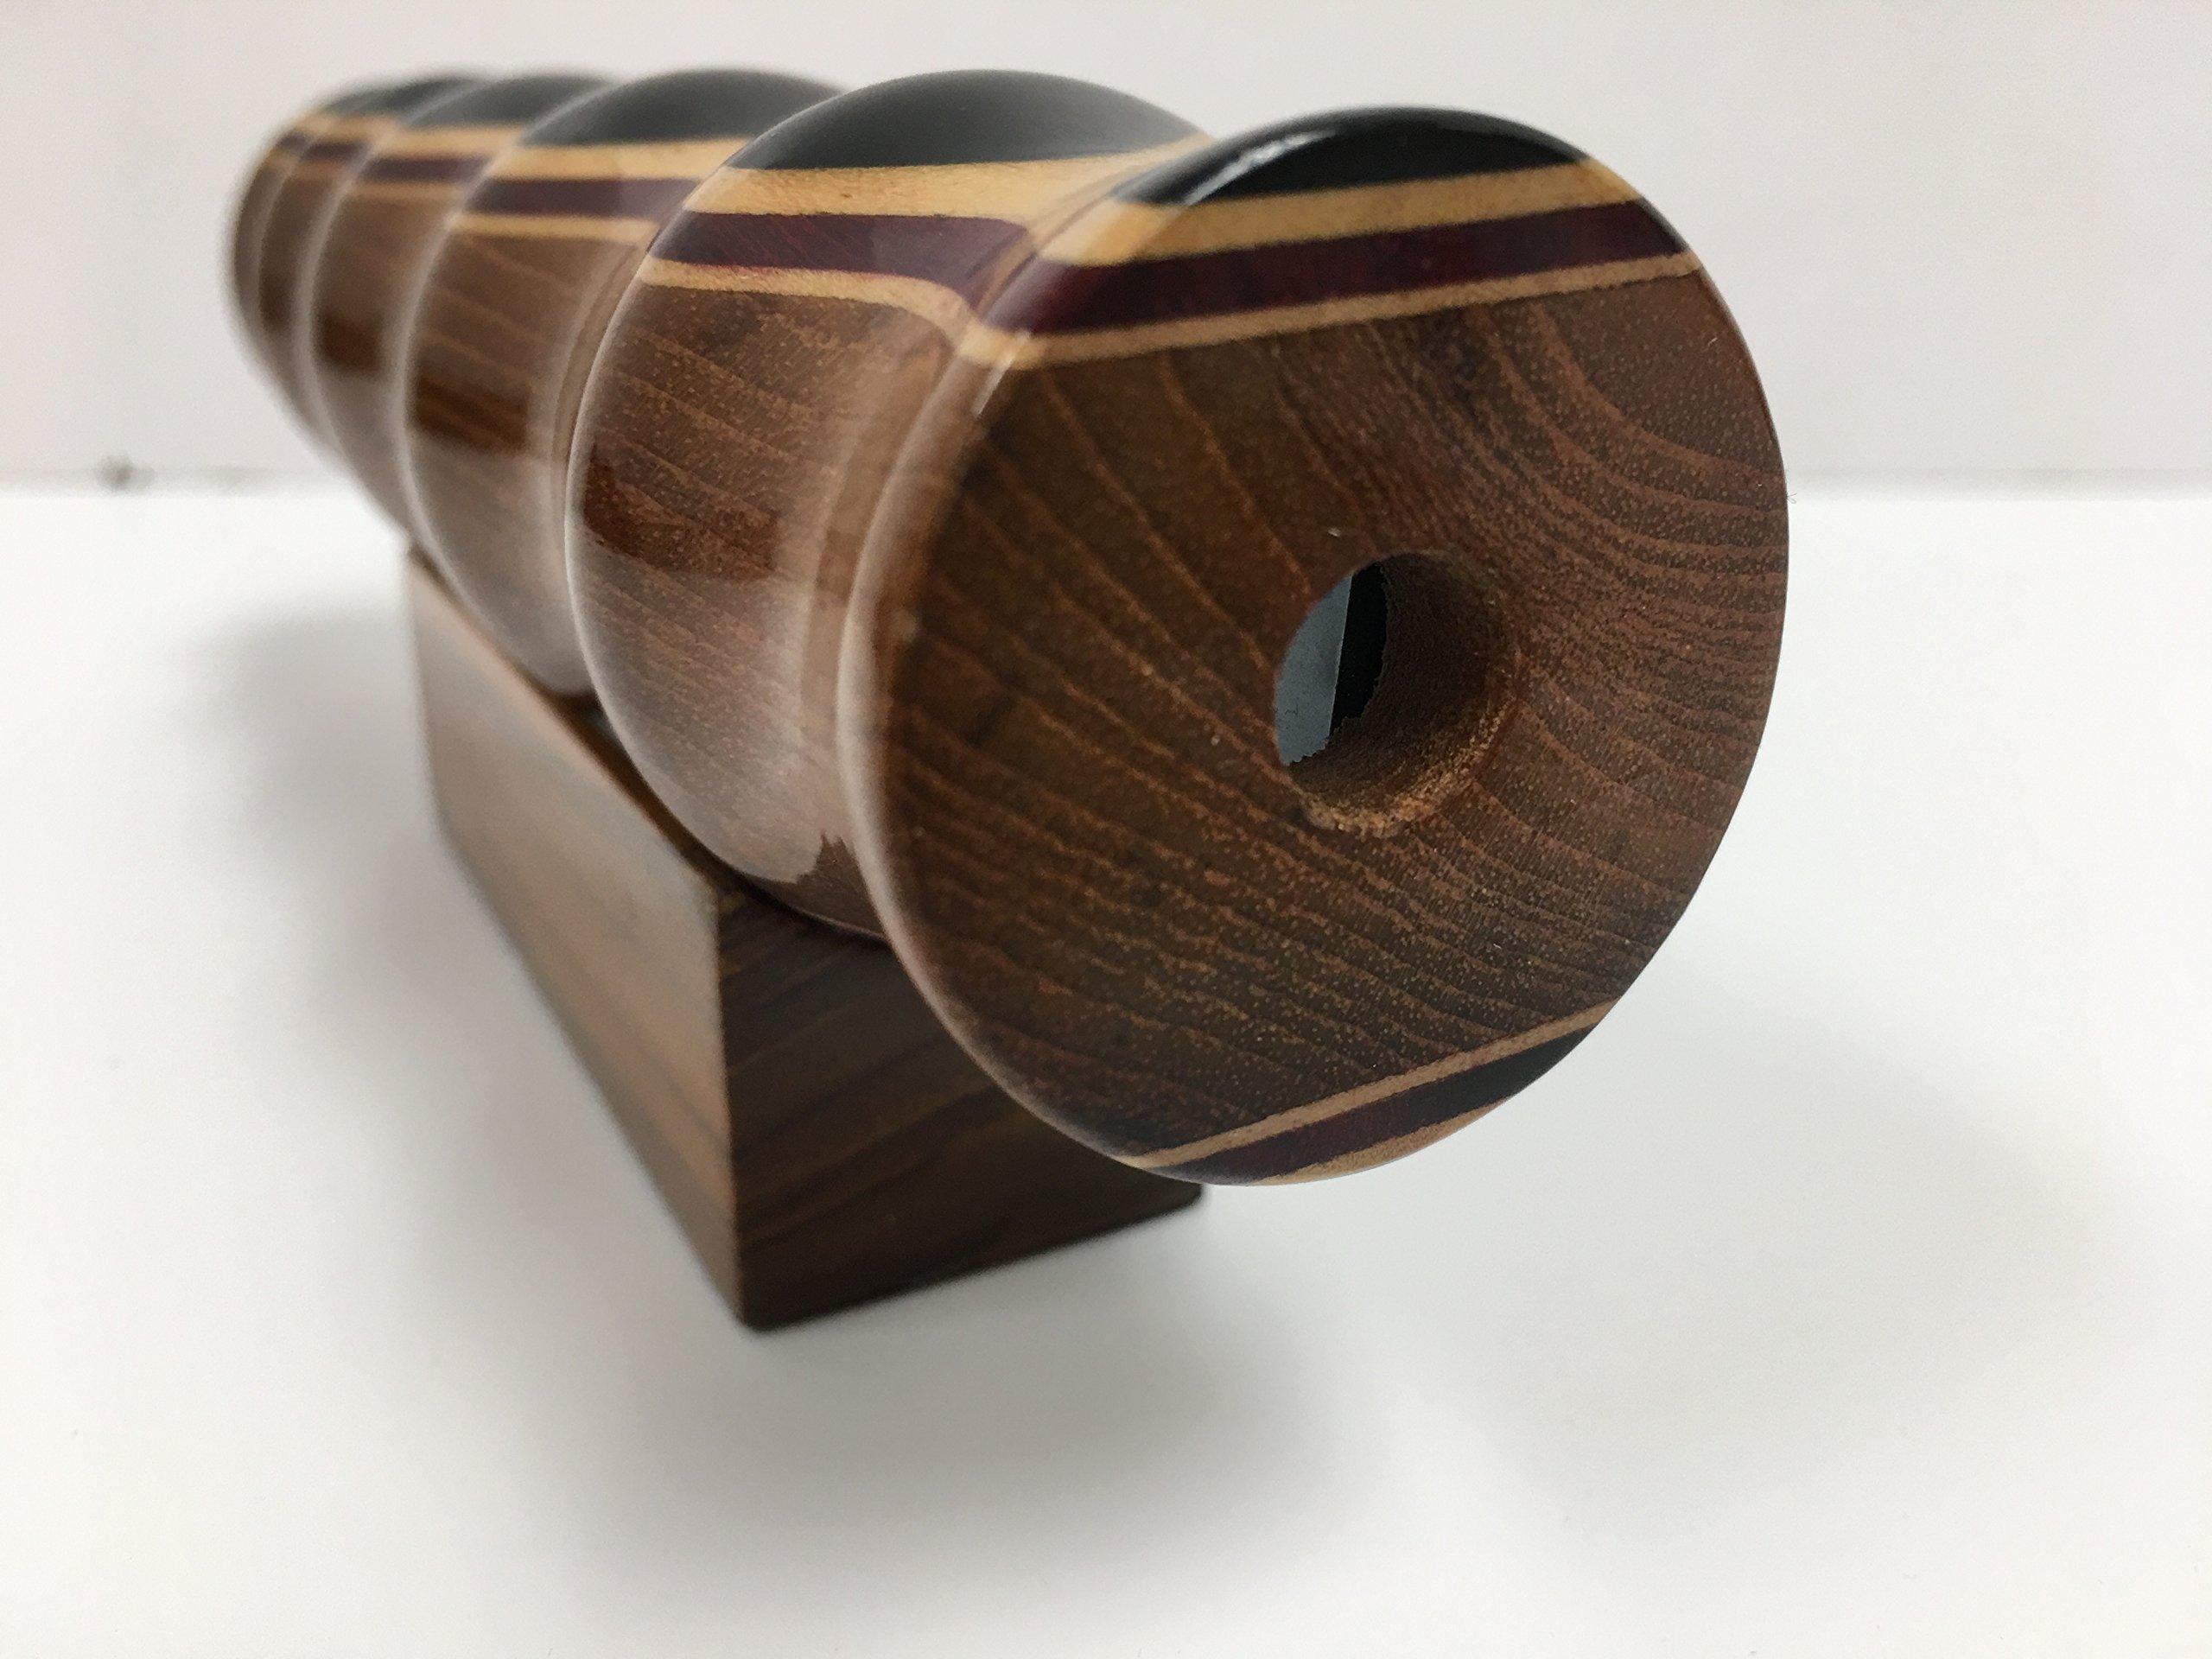 N & J Kaleidoscope Teleidoscope in Teak, 7 Inch Barrel, Laminated Solid Woods Including Padauk, Jalneem and Ebony by N & J (Image #3)